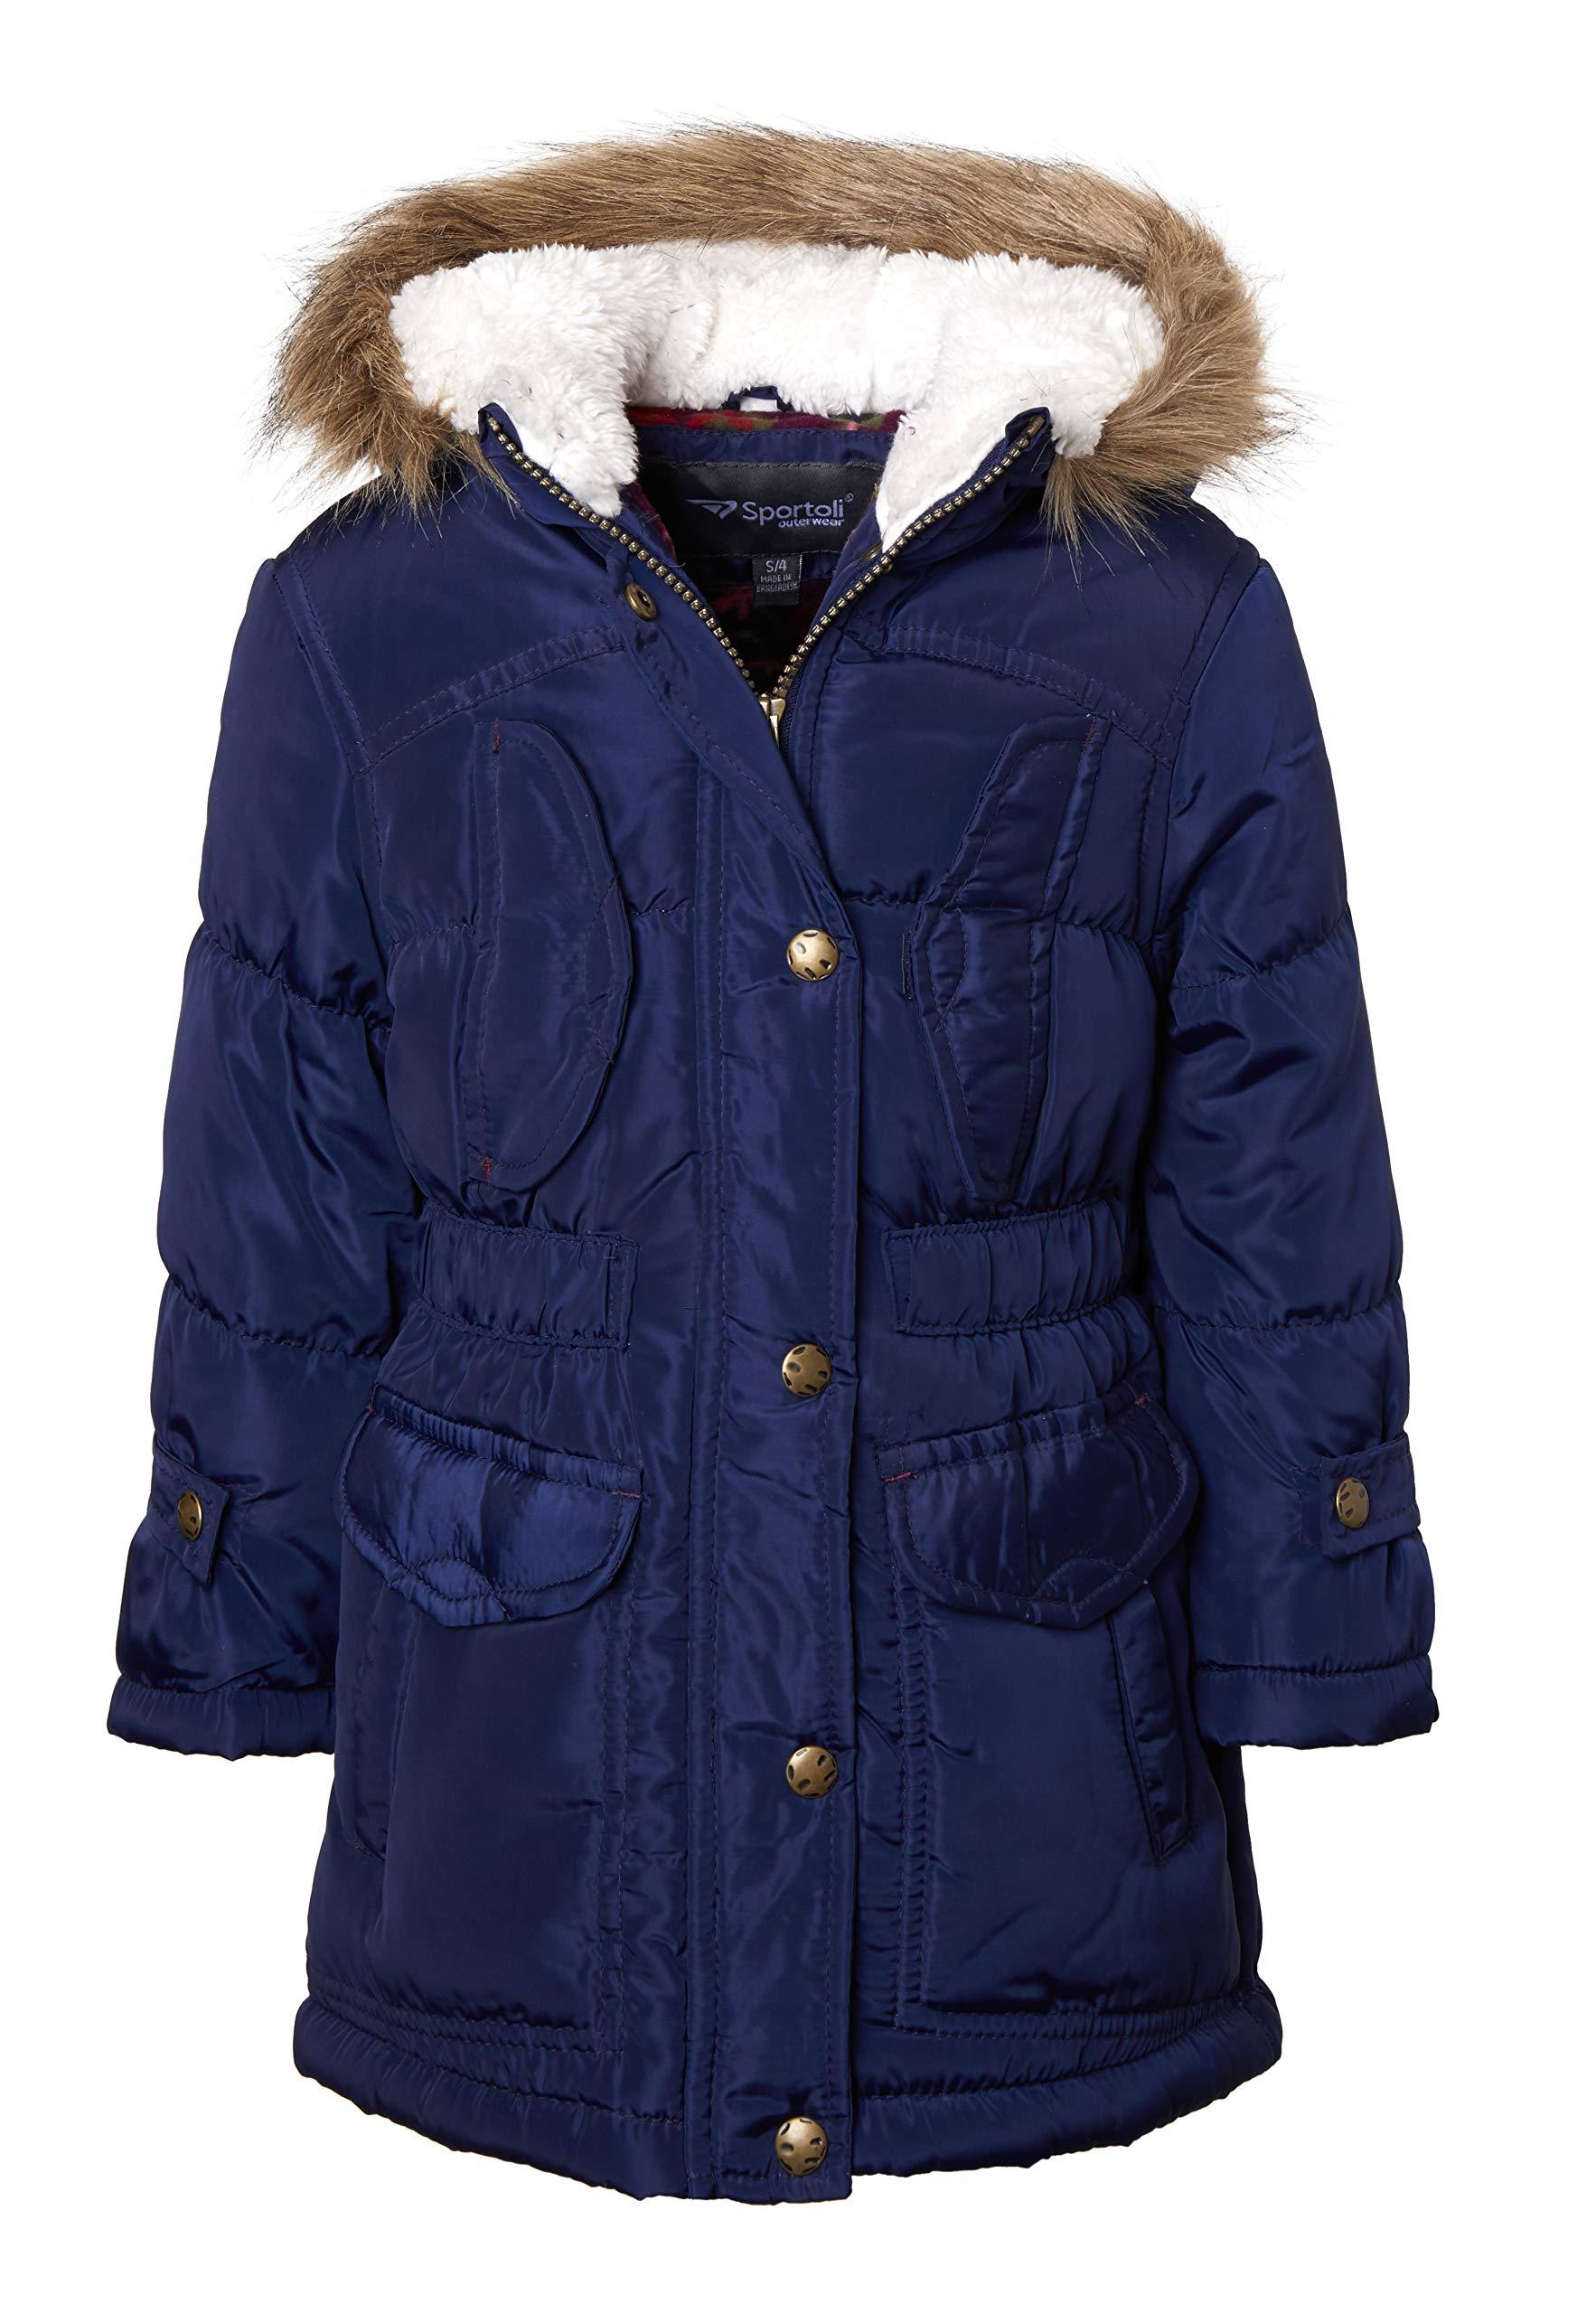 849b0263e4838 Sportoli Girls Fashion Winter Puffer Jacket Coat with Sherpa Lined Fur Trim  Hood product image